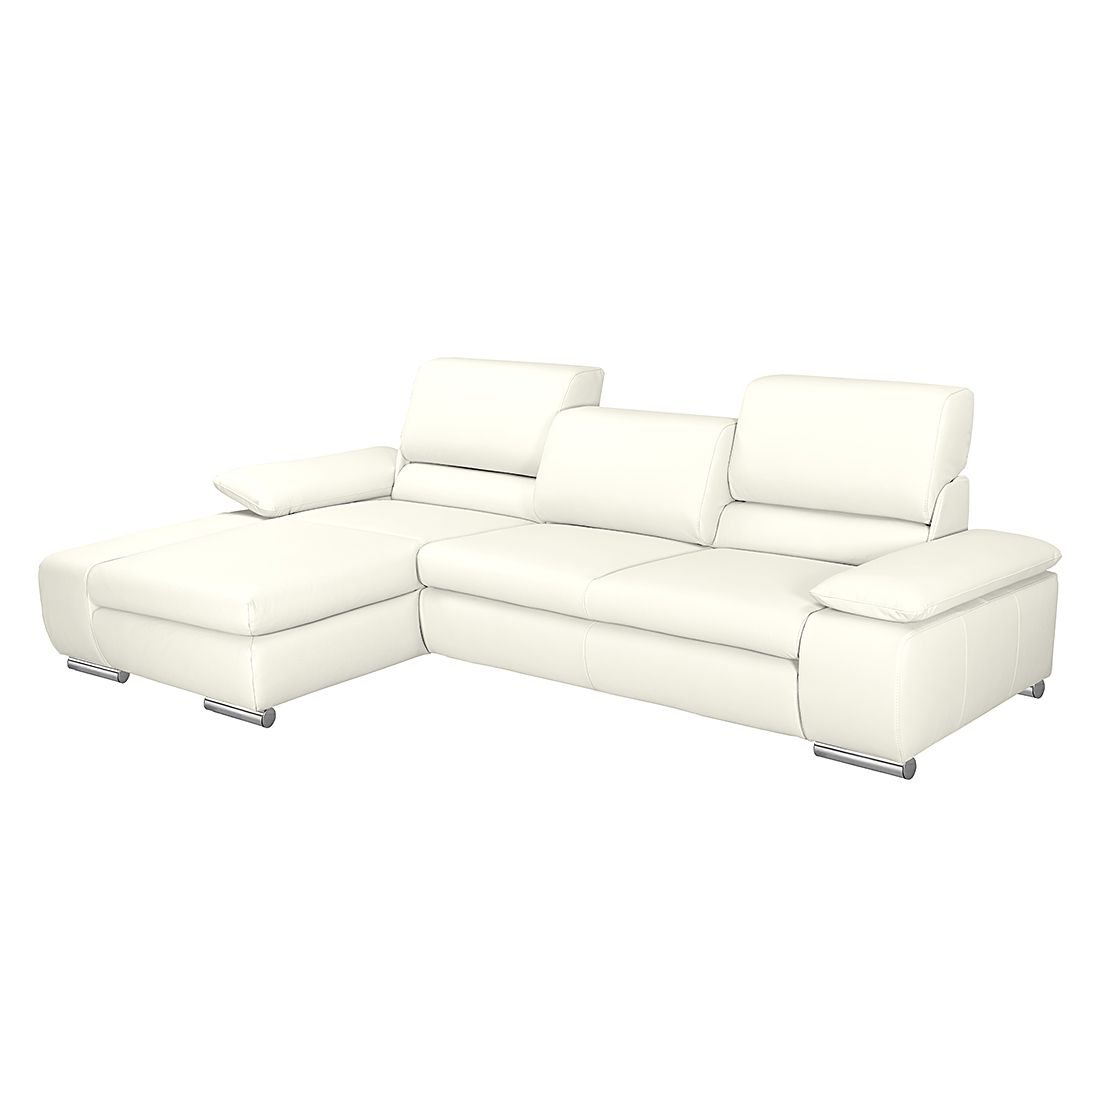 ecksofa quadro inspirierendes design f r wohnm bel. Black Bedroom Furniture Sets. Home Design Ideas